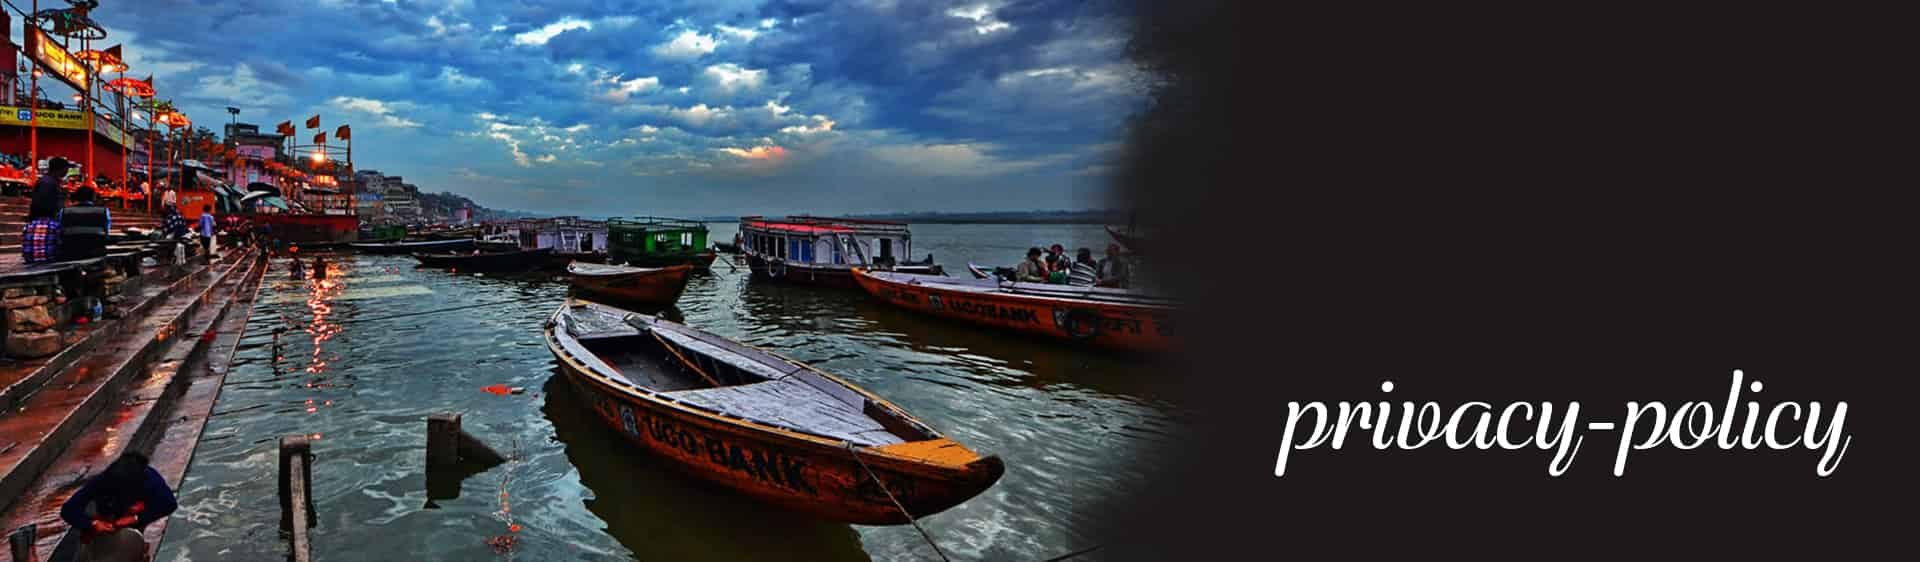 shirdi tour package from bangalore, shirdi tour package from chennai, shirdi tour package from coimbatore